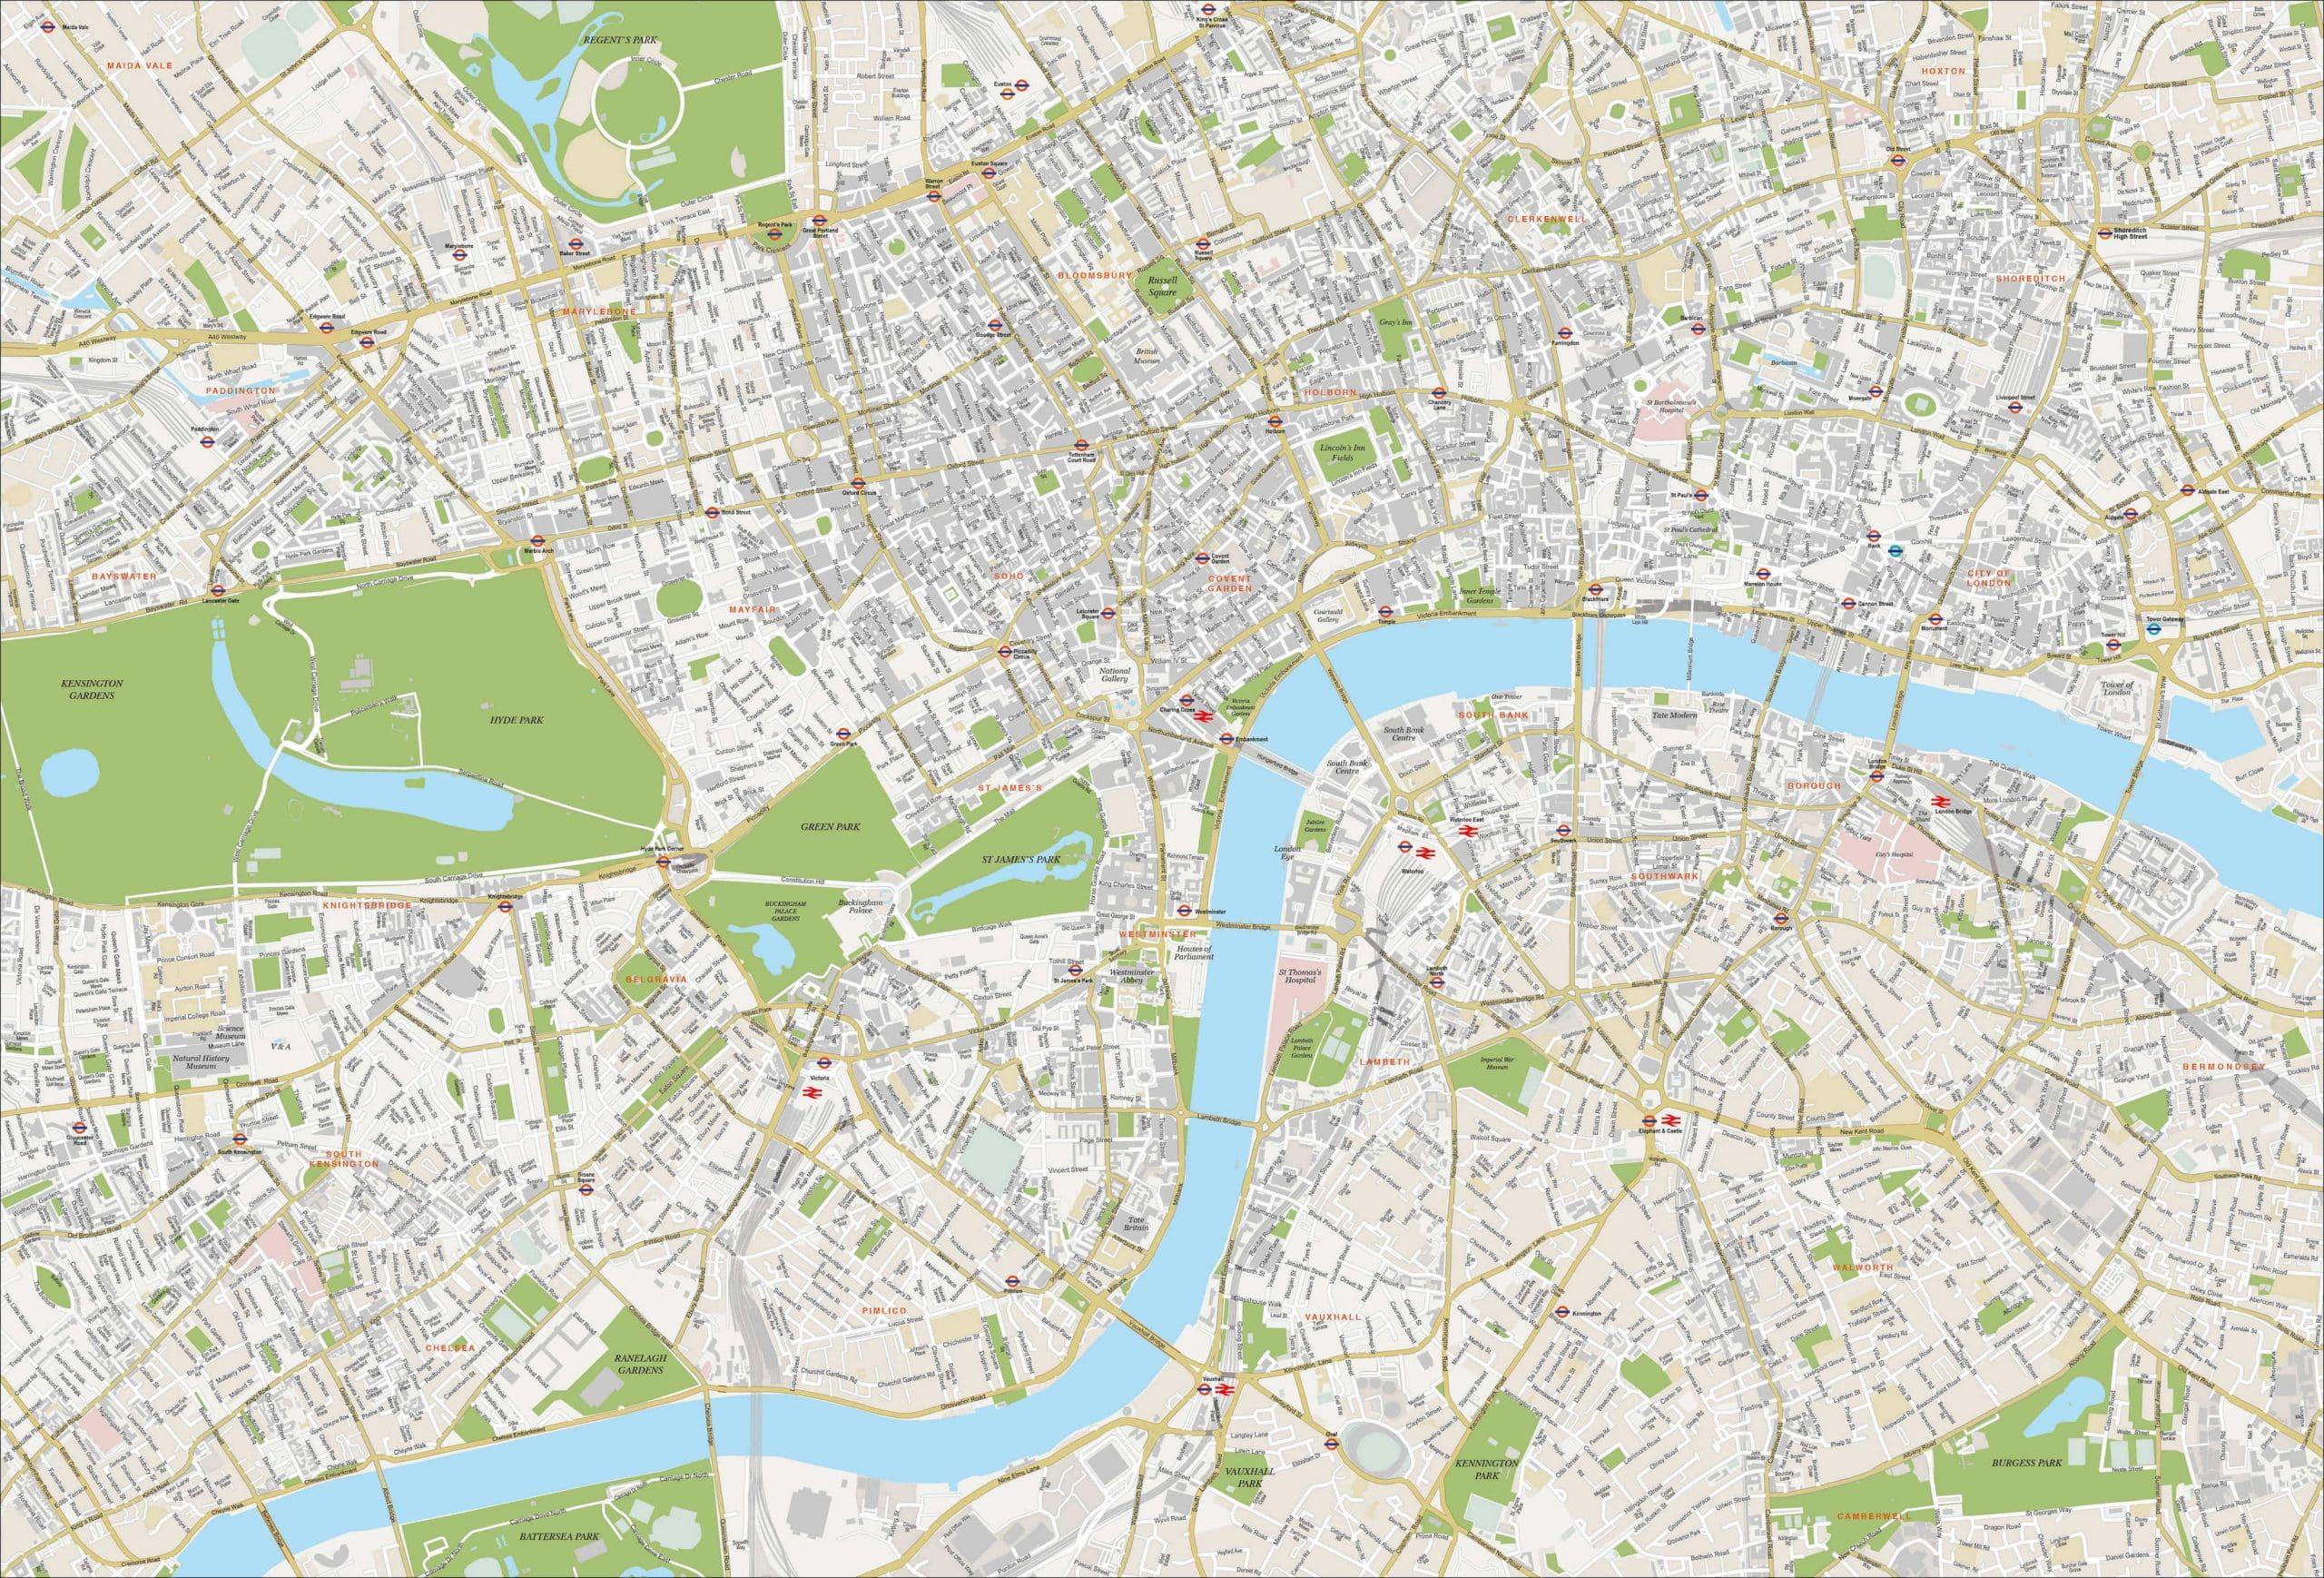 Zone Di Londra Cartina.Mappe E Percorsi Dettagliati Di Londra